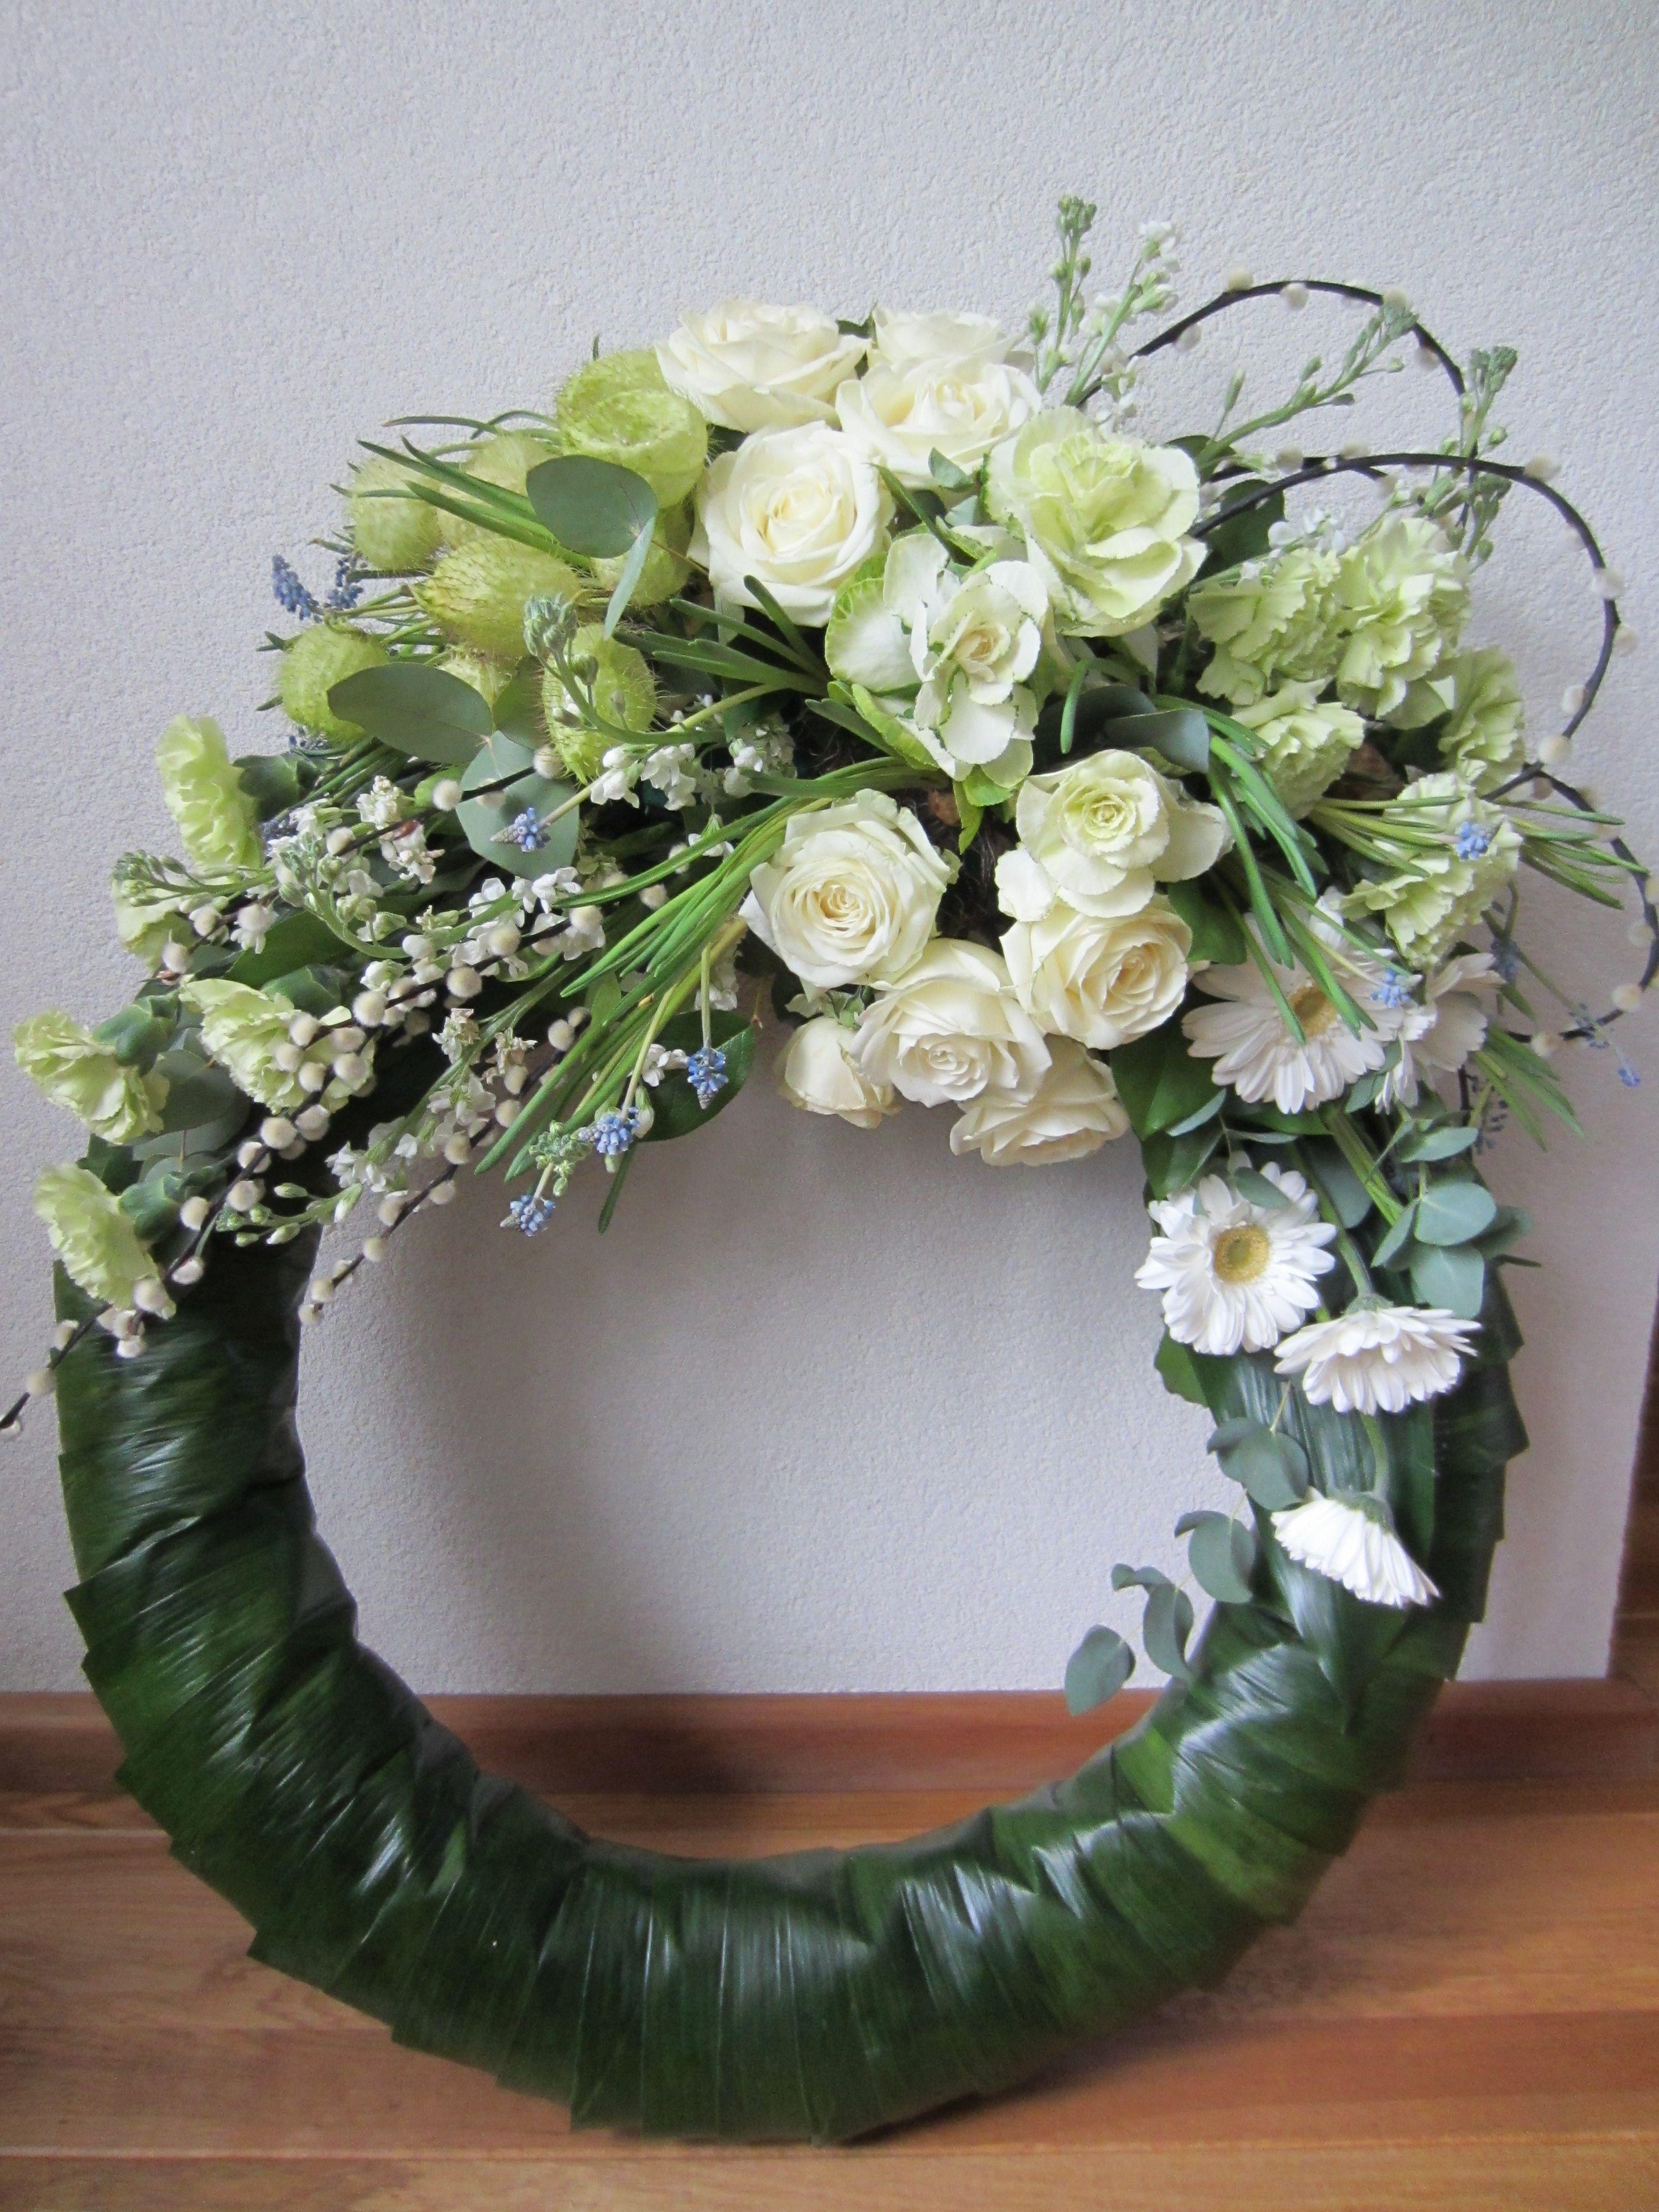 Funeral Arrangement Wreaths Funeral Floral